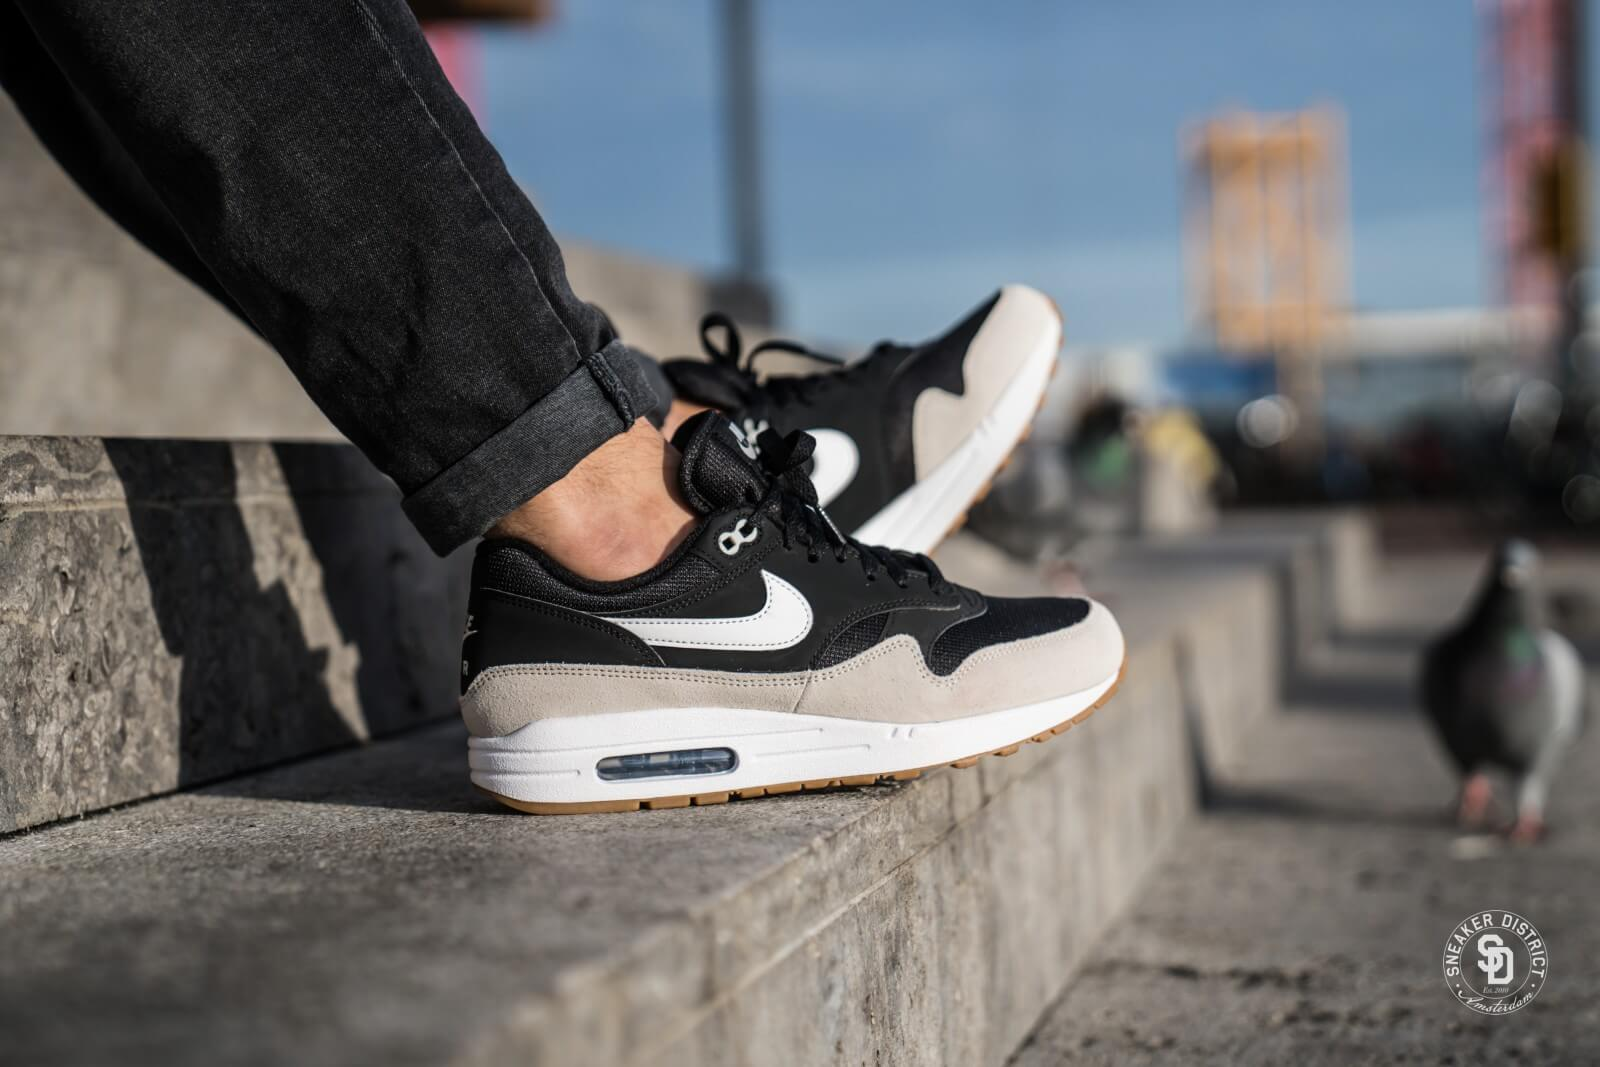 Nike Air Max 1 Black White Light Bone Ah8145 009